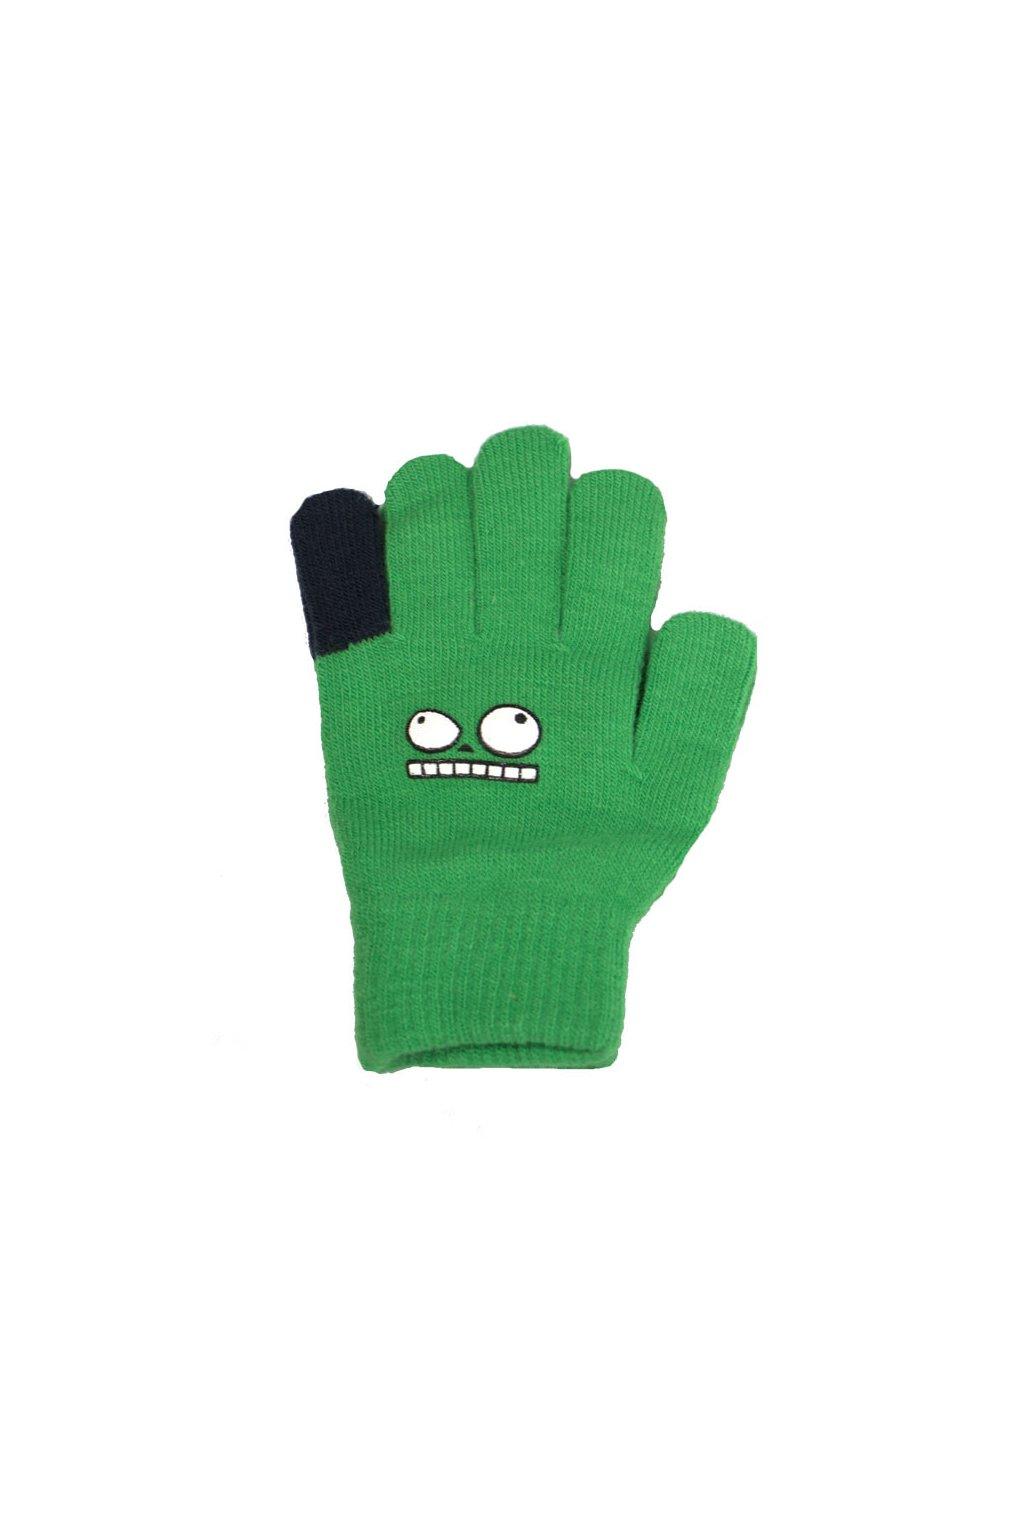 MS007 zelena